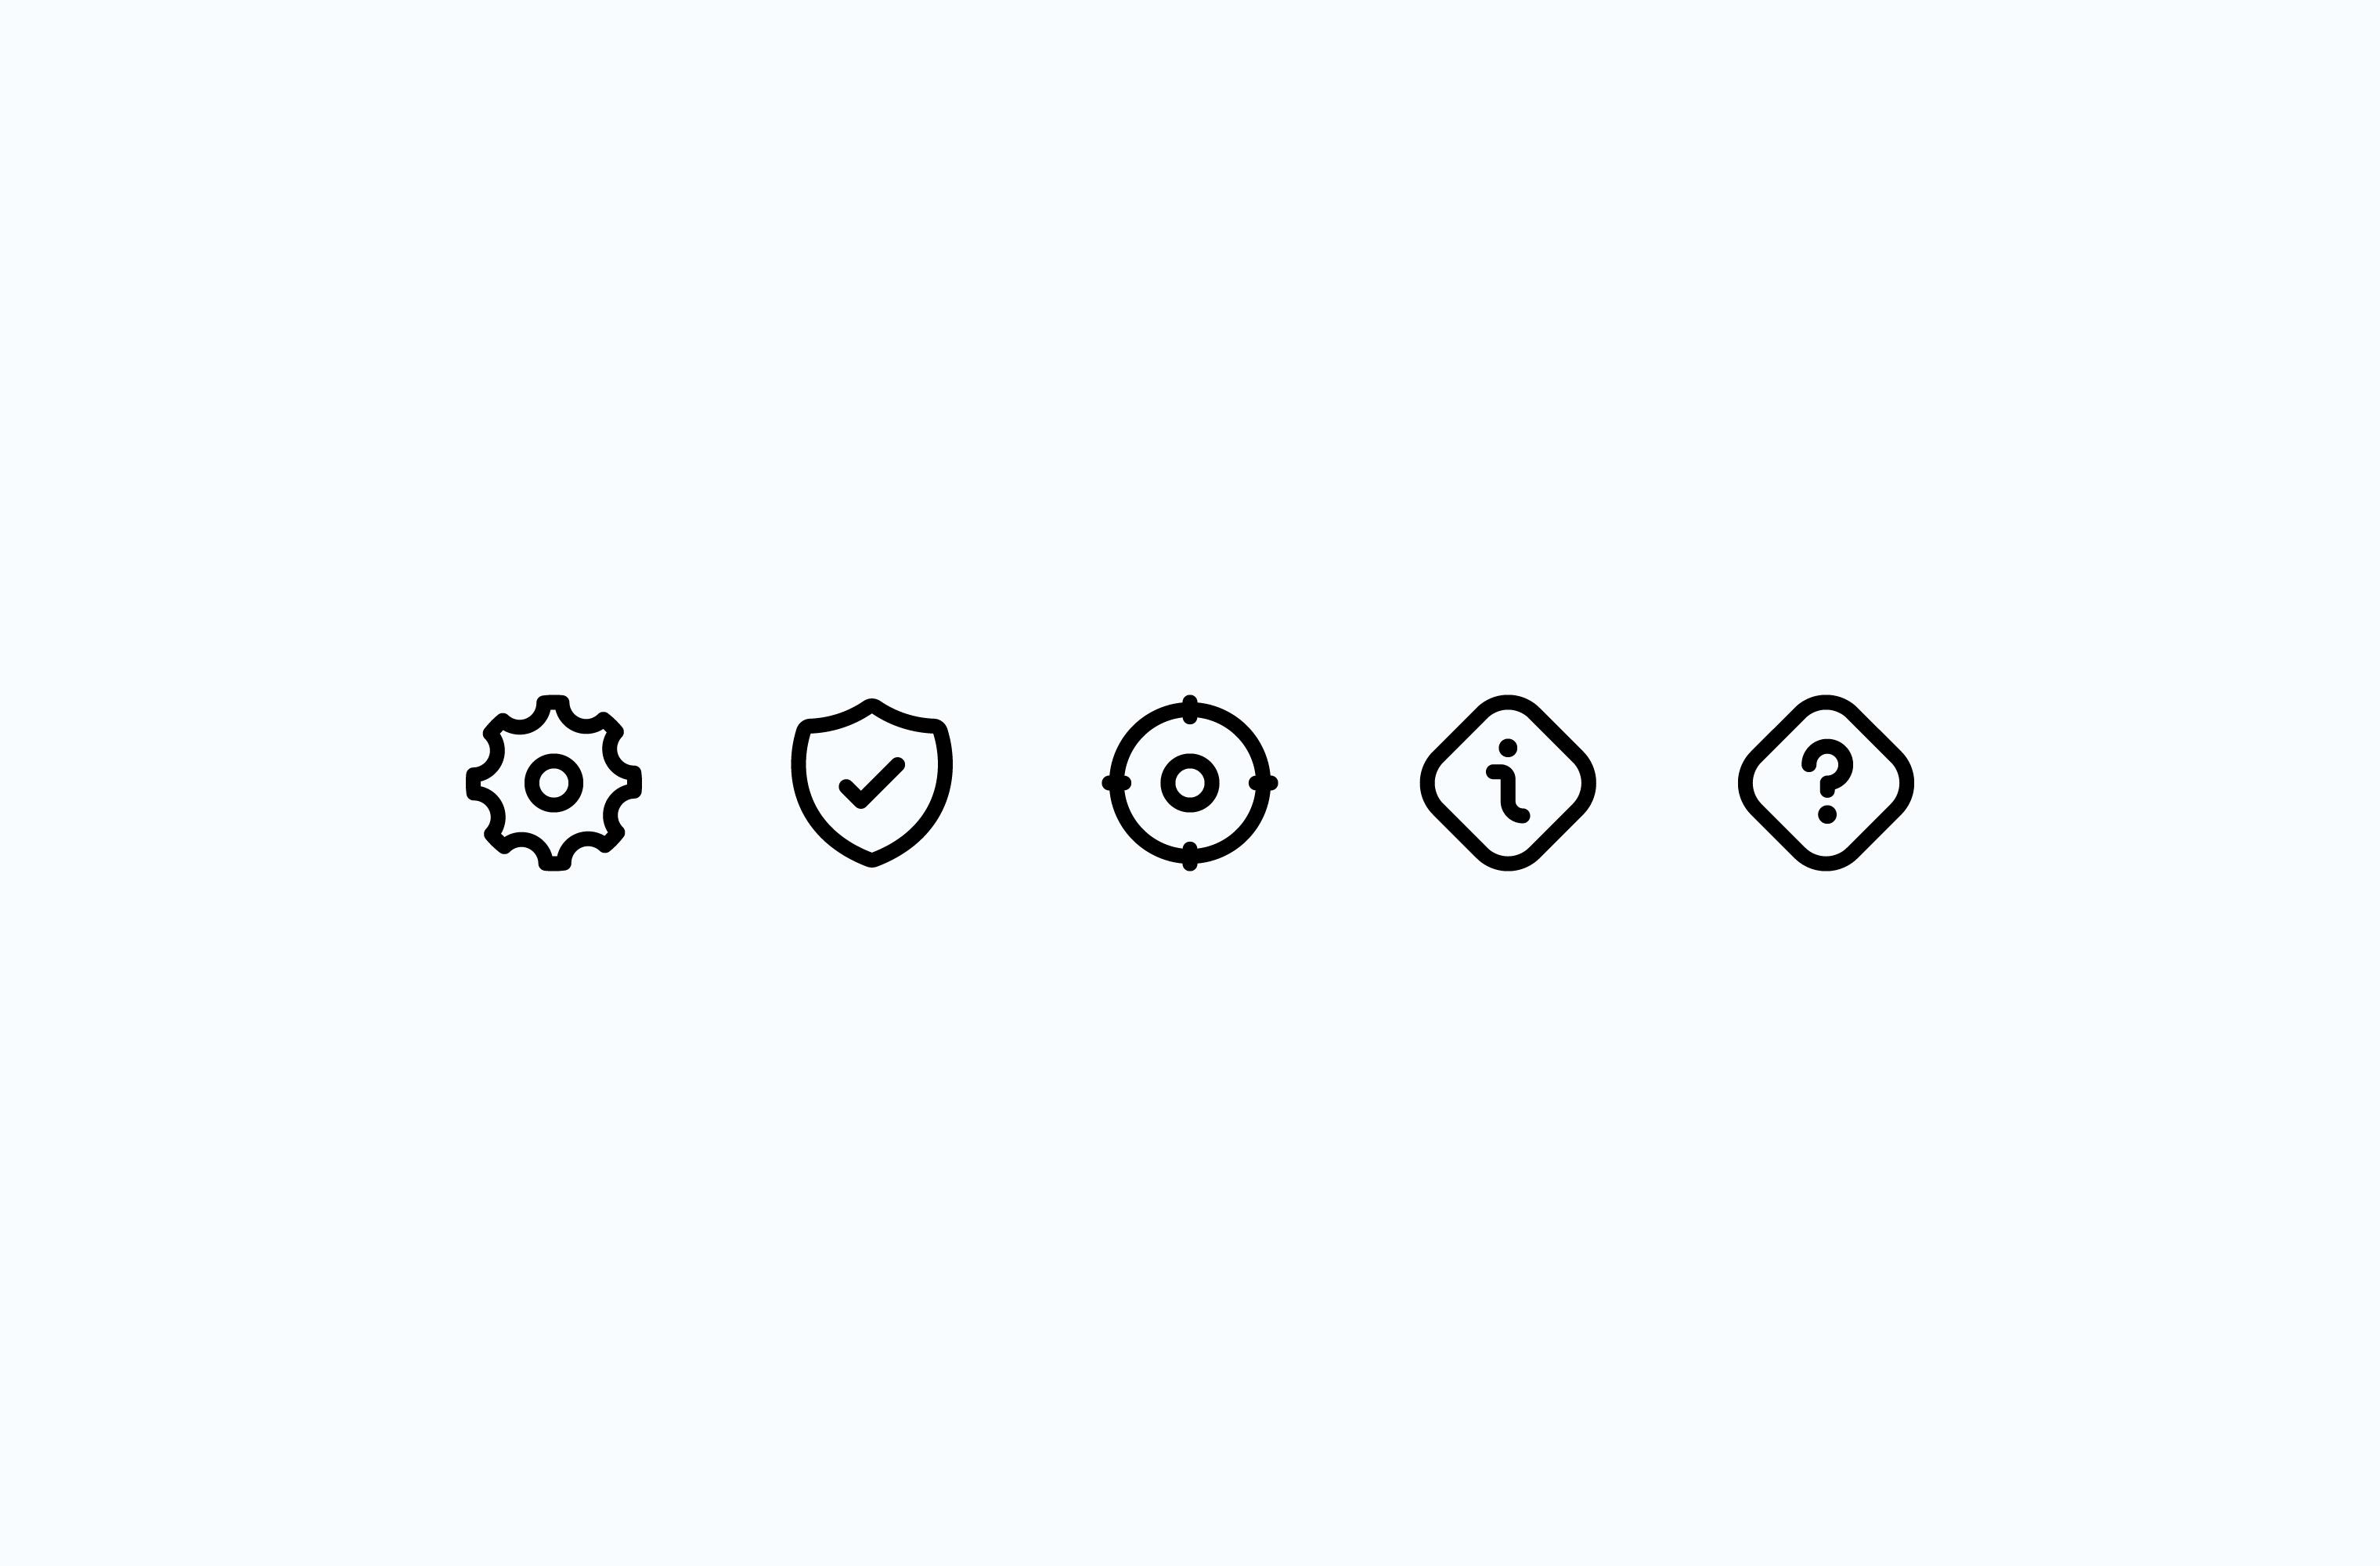 Nomadic app icon set